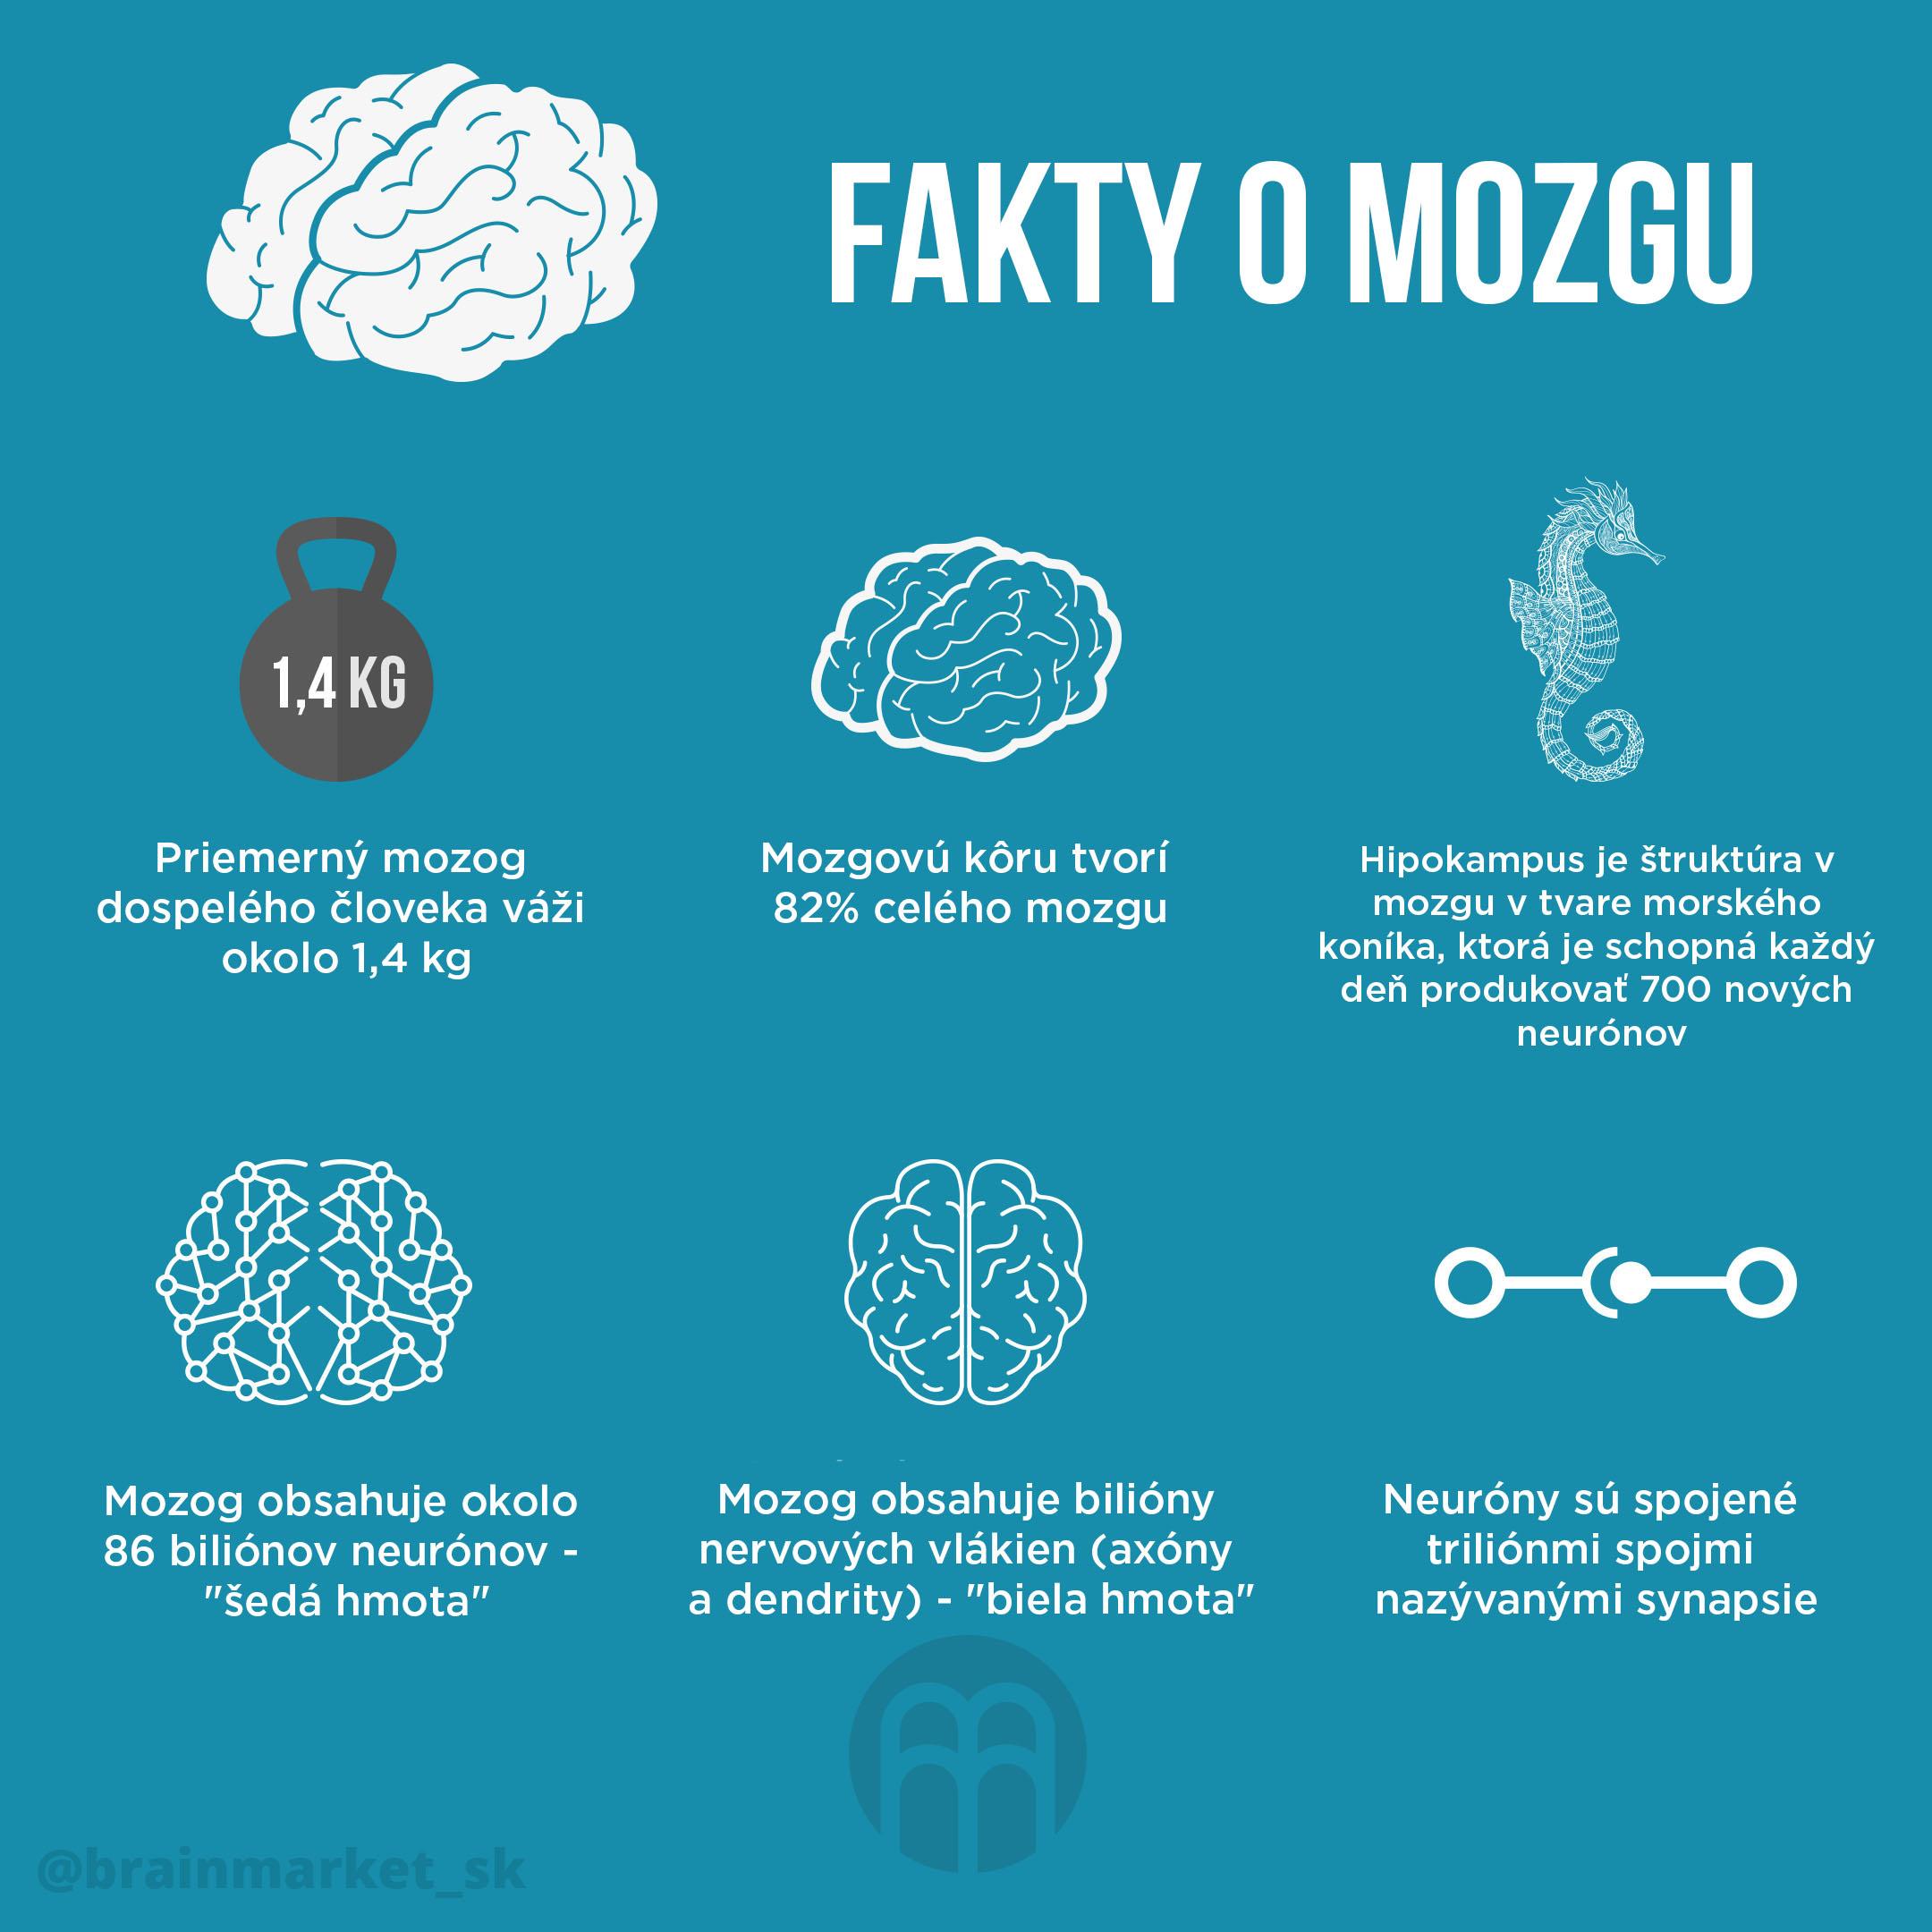 fakta-o-mozku_infografika_brainmarket_sk